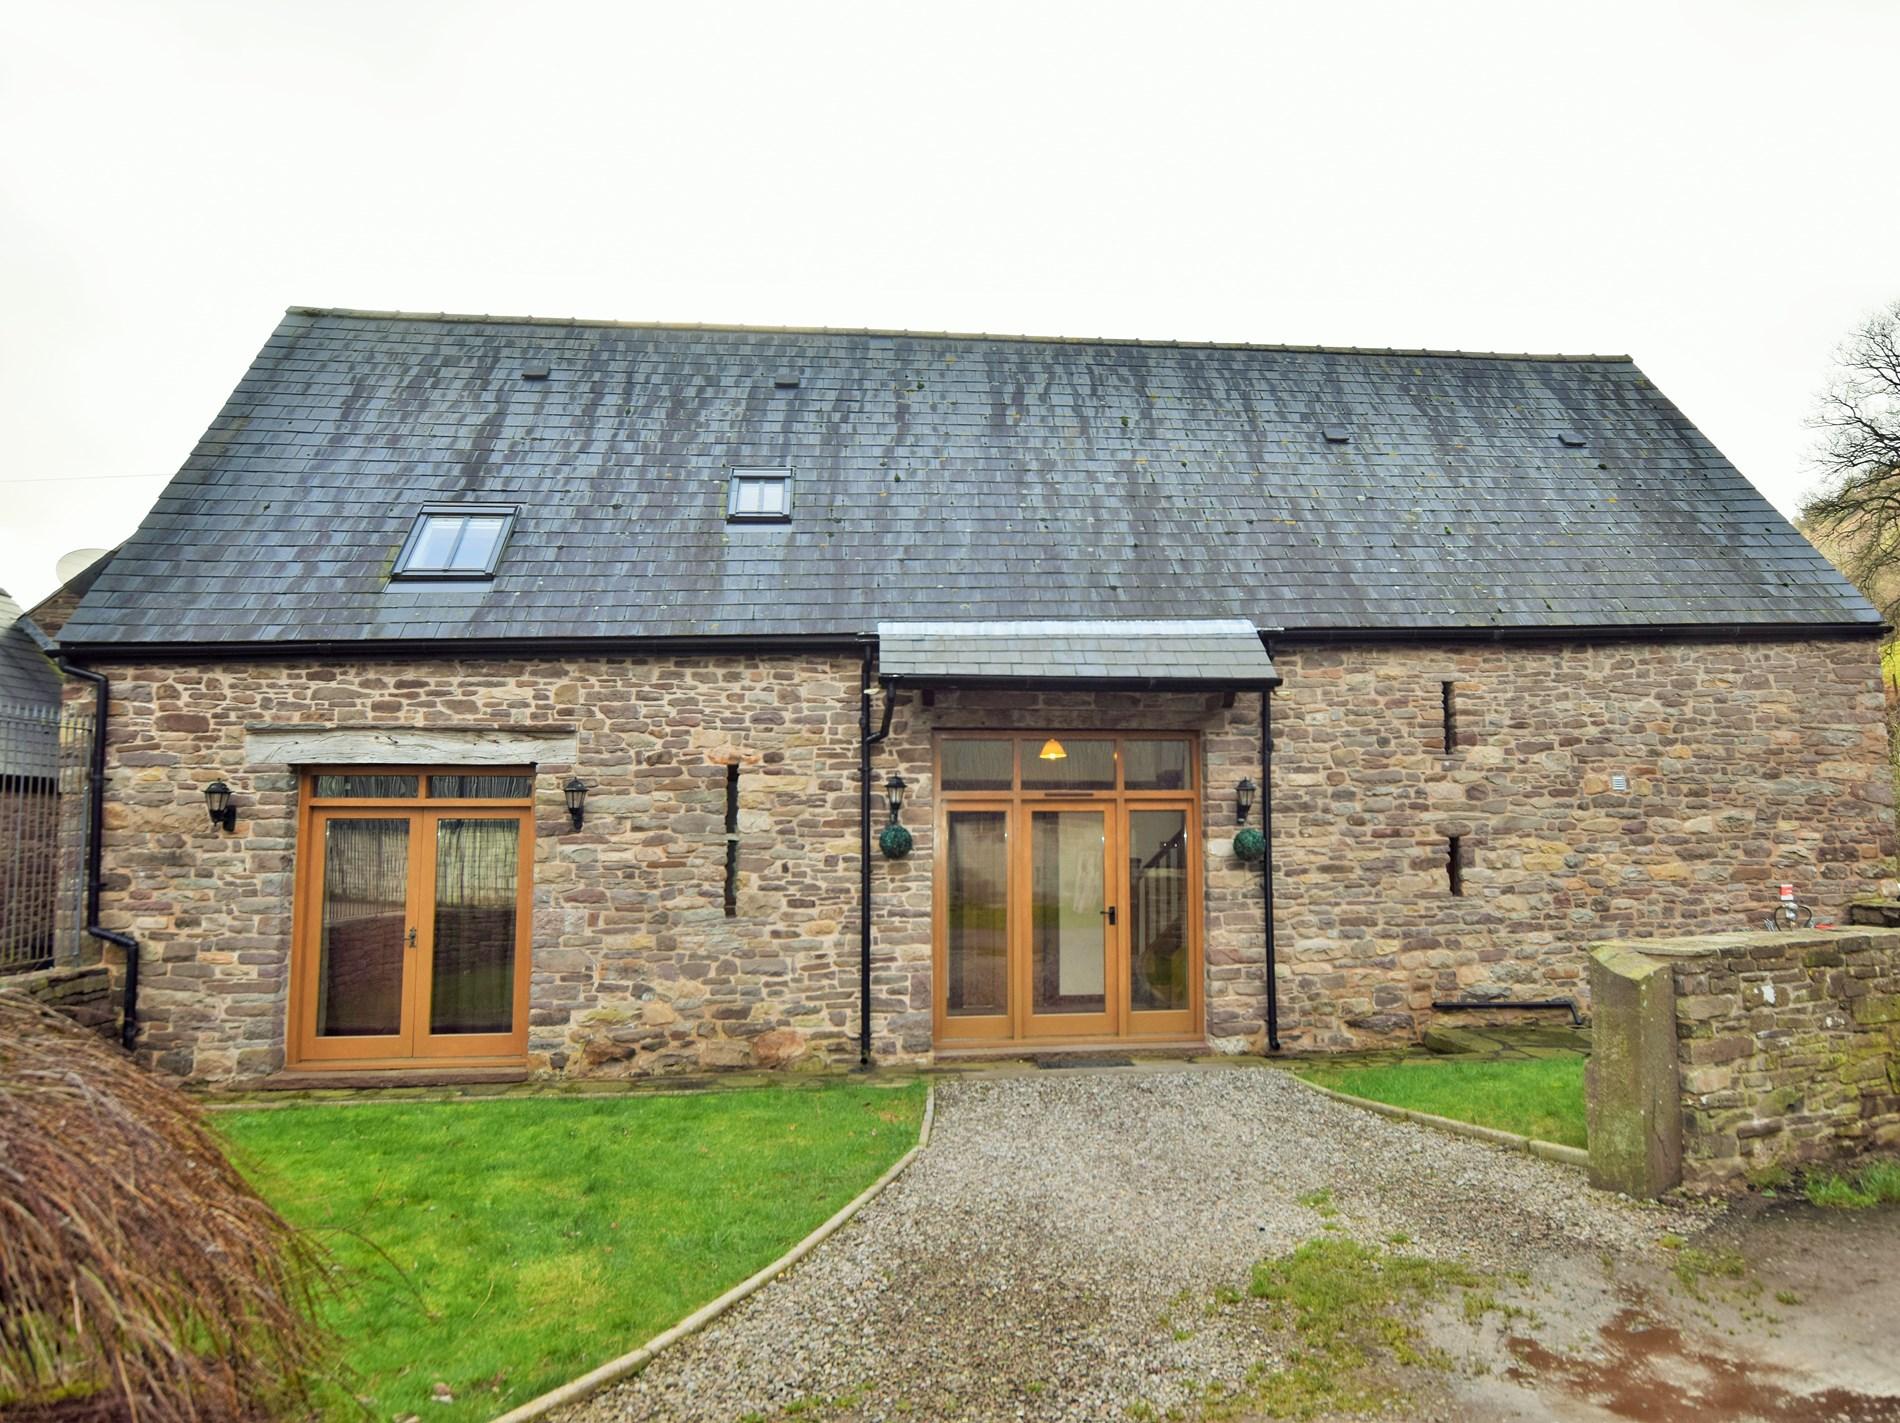 4 Bedroom Cottage in Crickhowell, Mid Wales